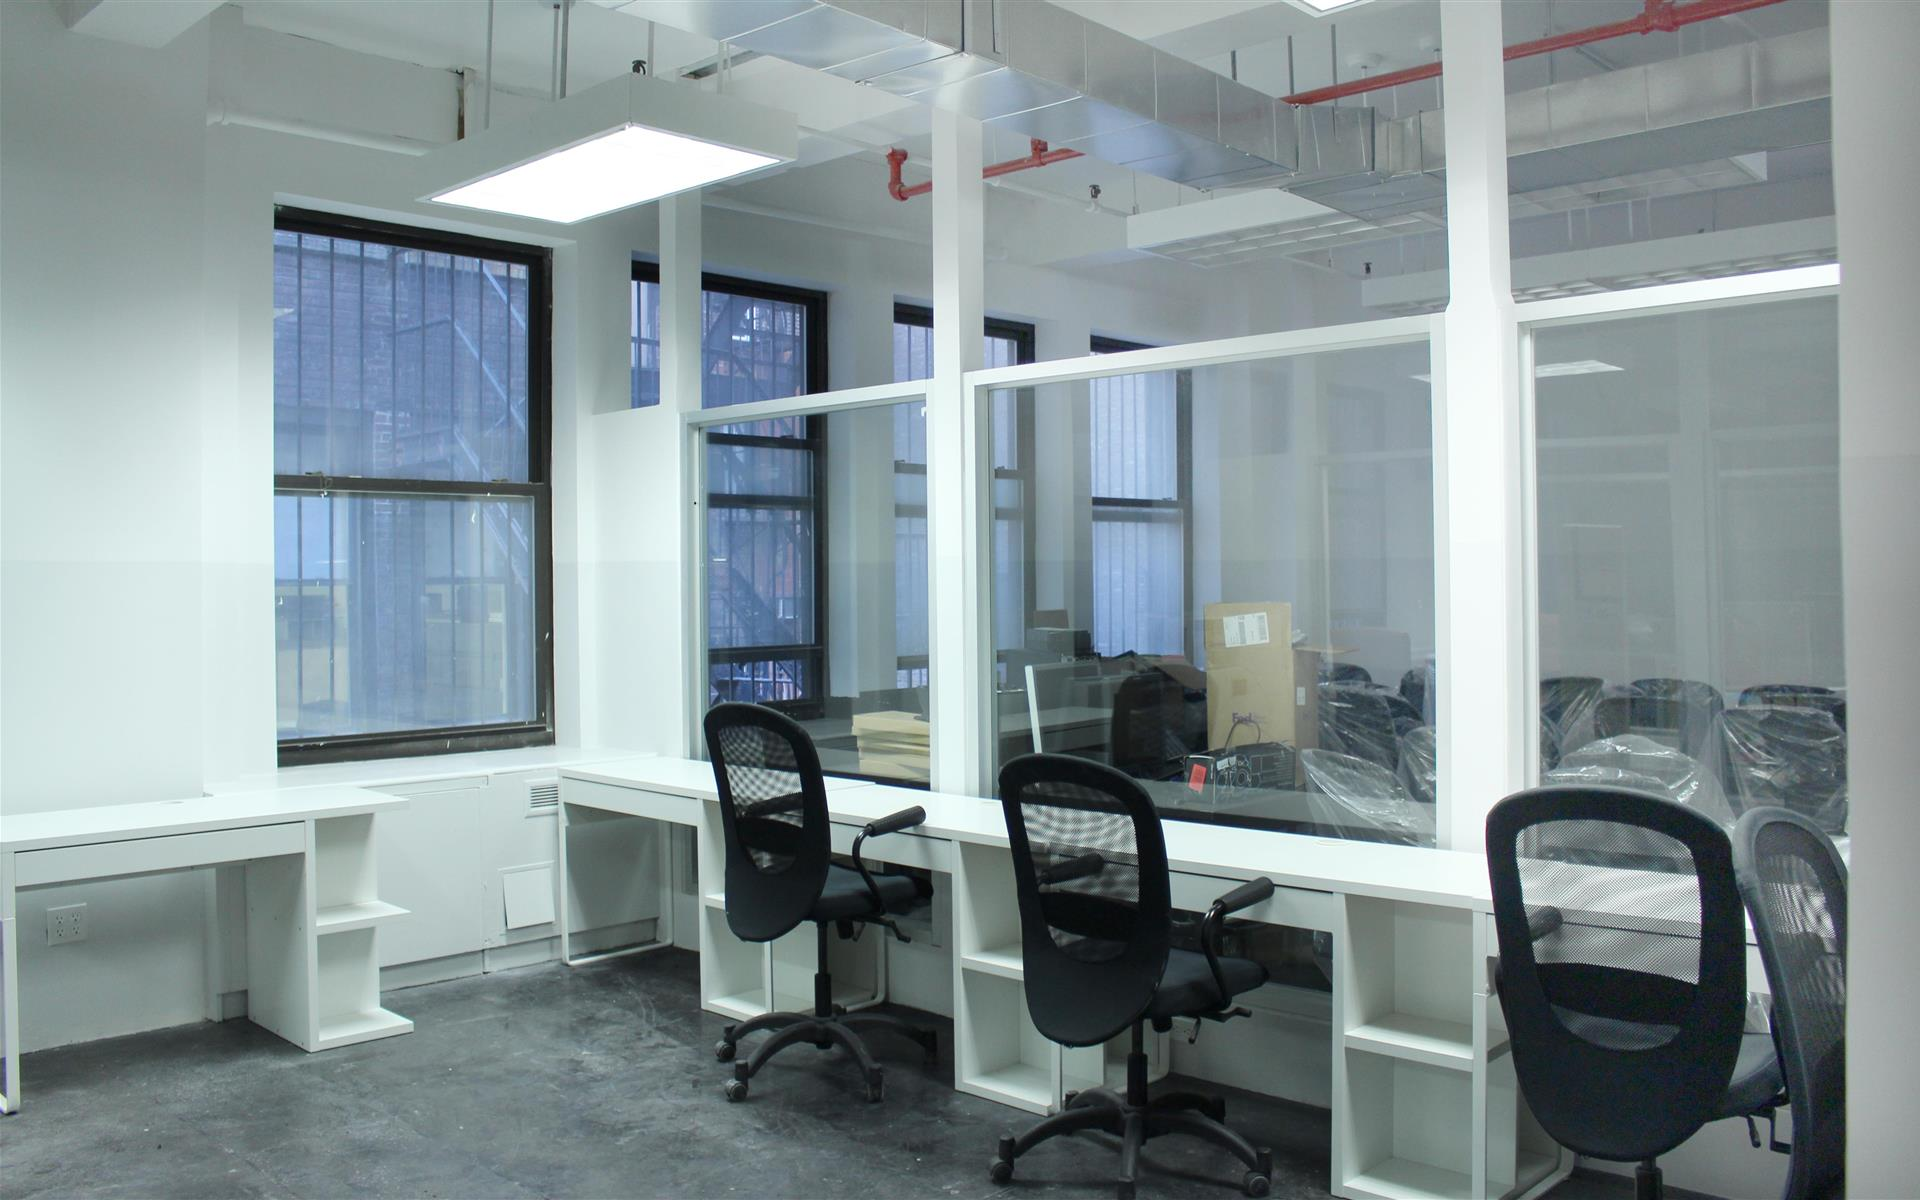 Ensemble - Coworking in Midtown Manhattan - Team Office for 15